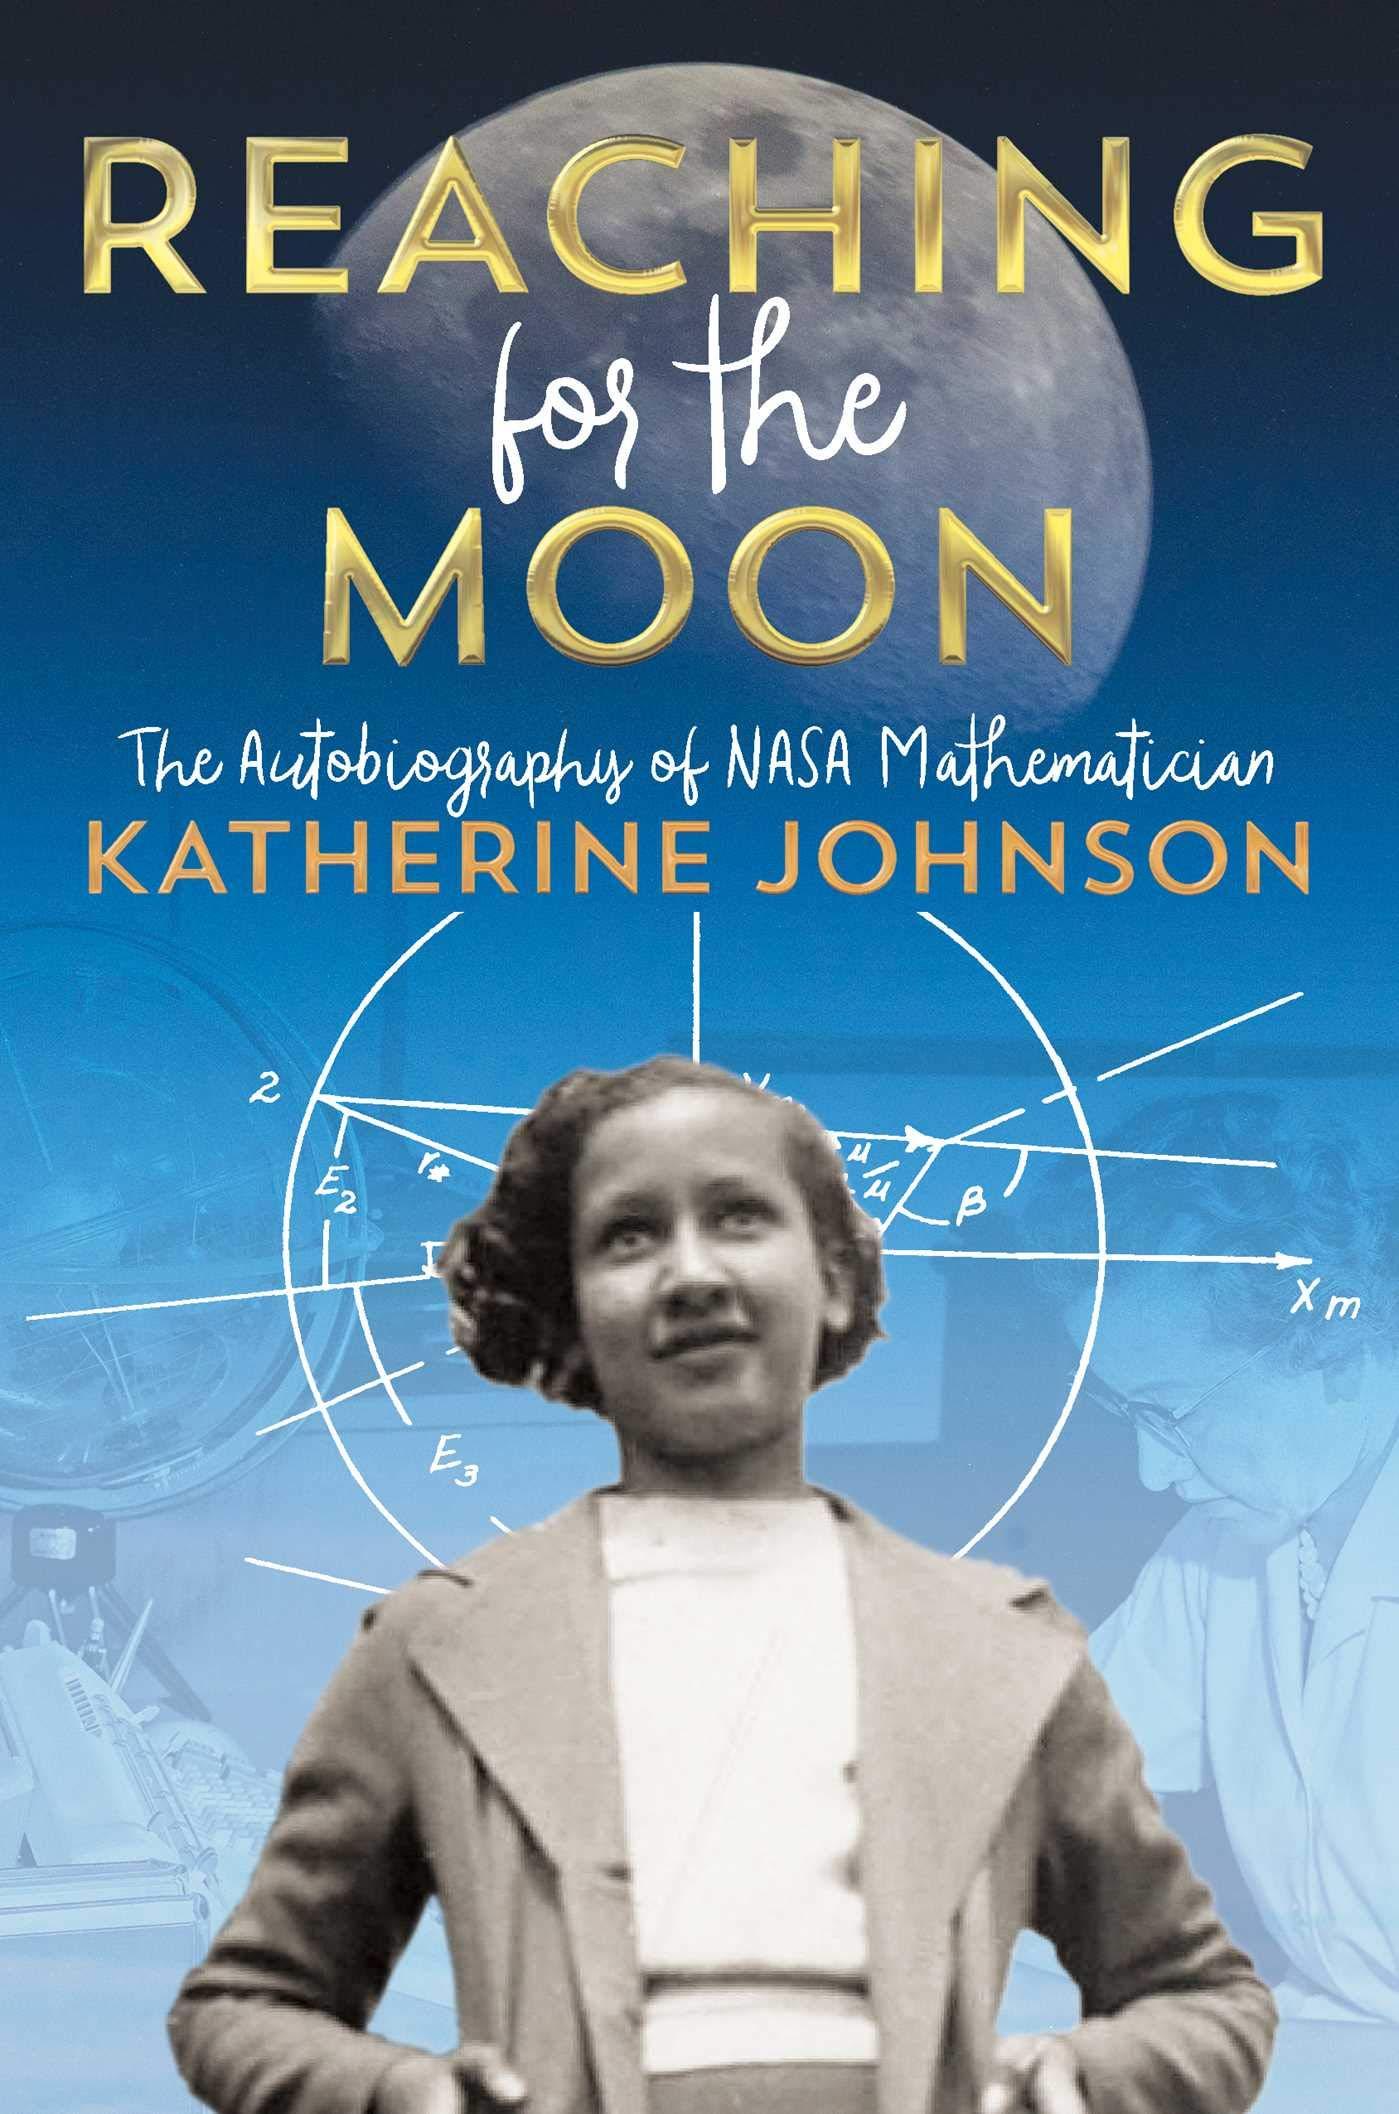 Reaching for the Moon: The Autobiography of NASA Mathematician Katherine  Johnson: Johnson, Katherine: 9781534440838: Amazon.com: Books